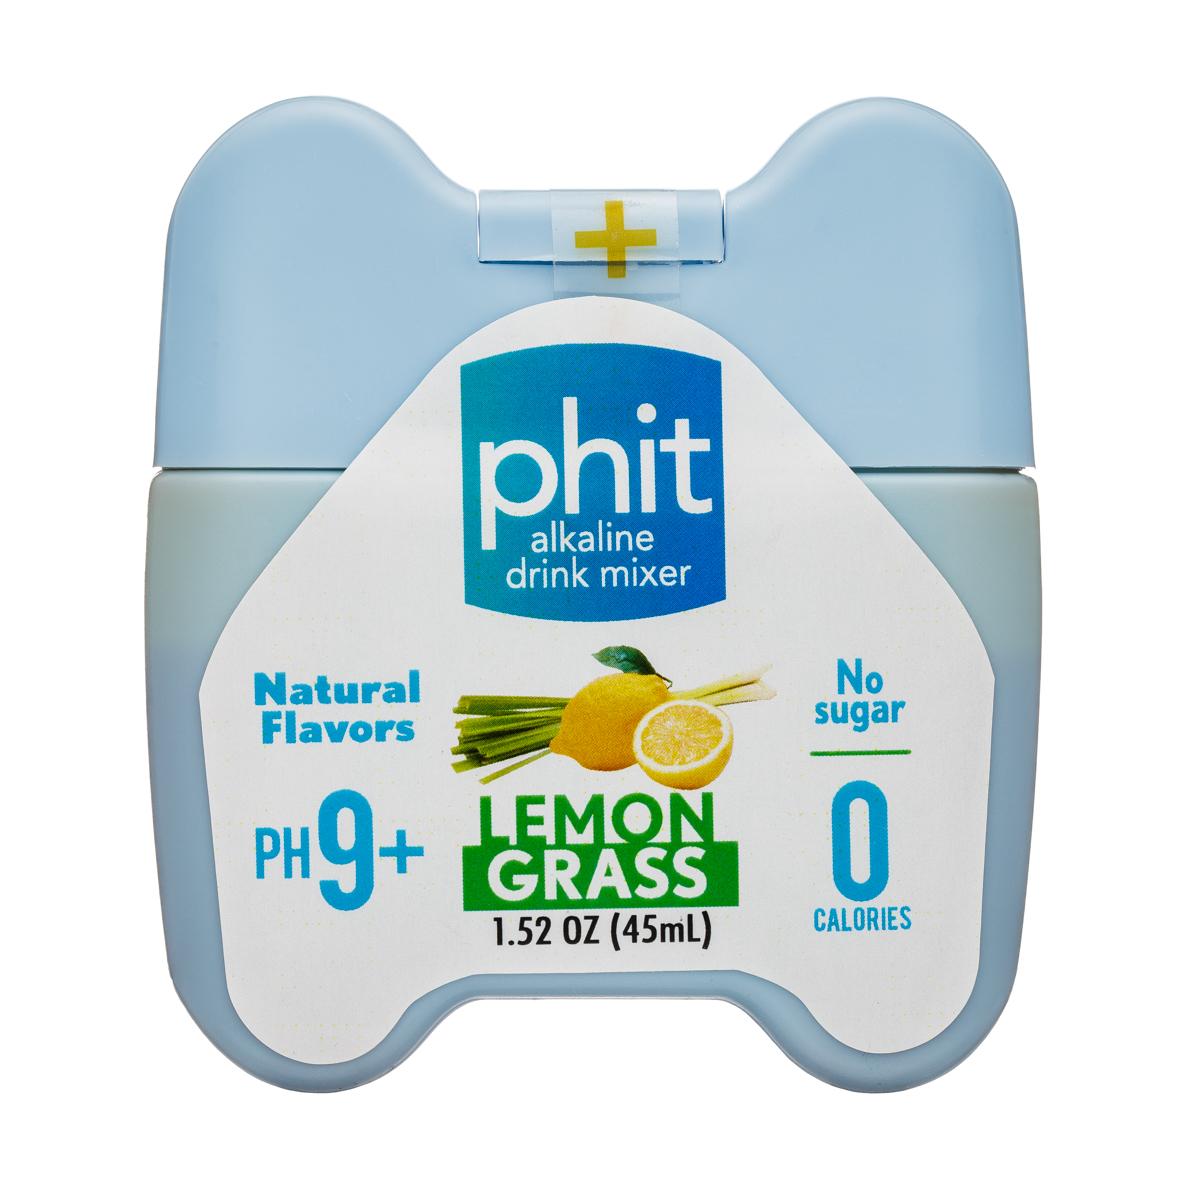 pHit: phit-1oz-AlkalineMixer-Lemongrass-Front